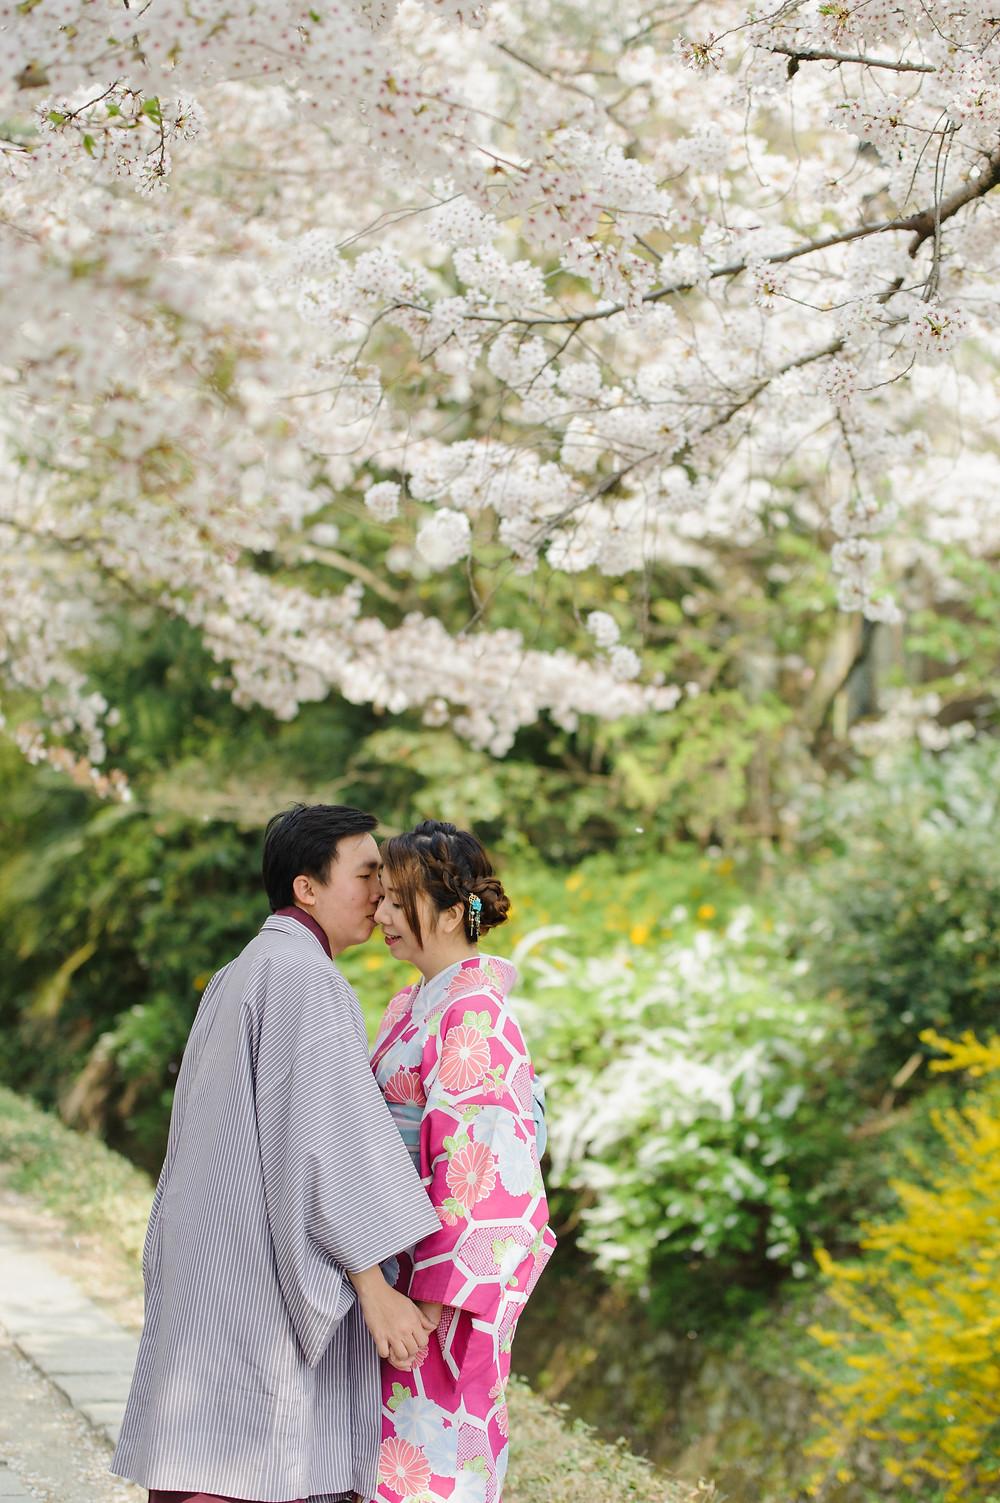 Kissing under the Sakura